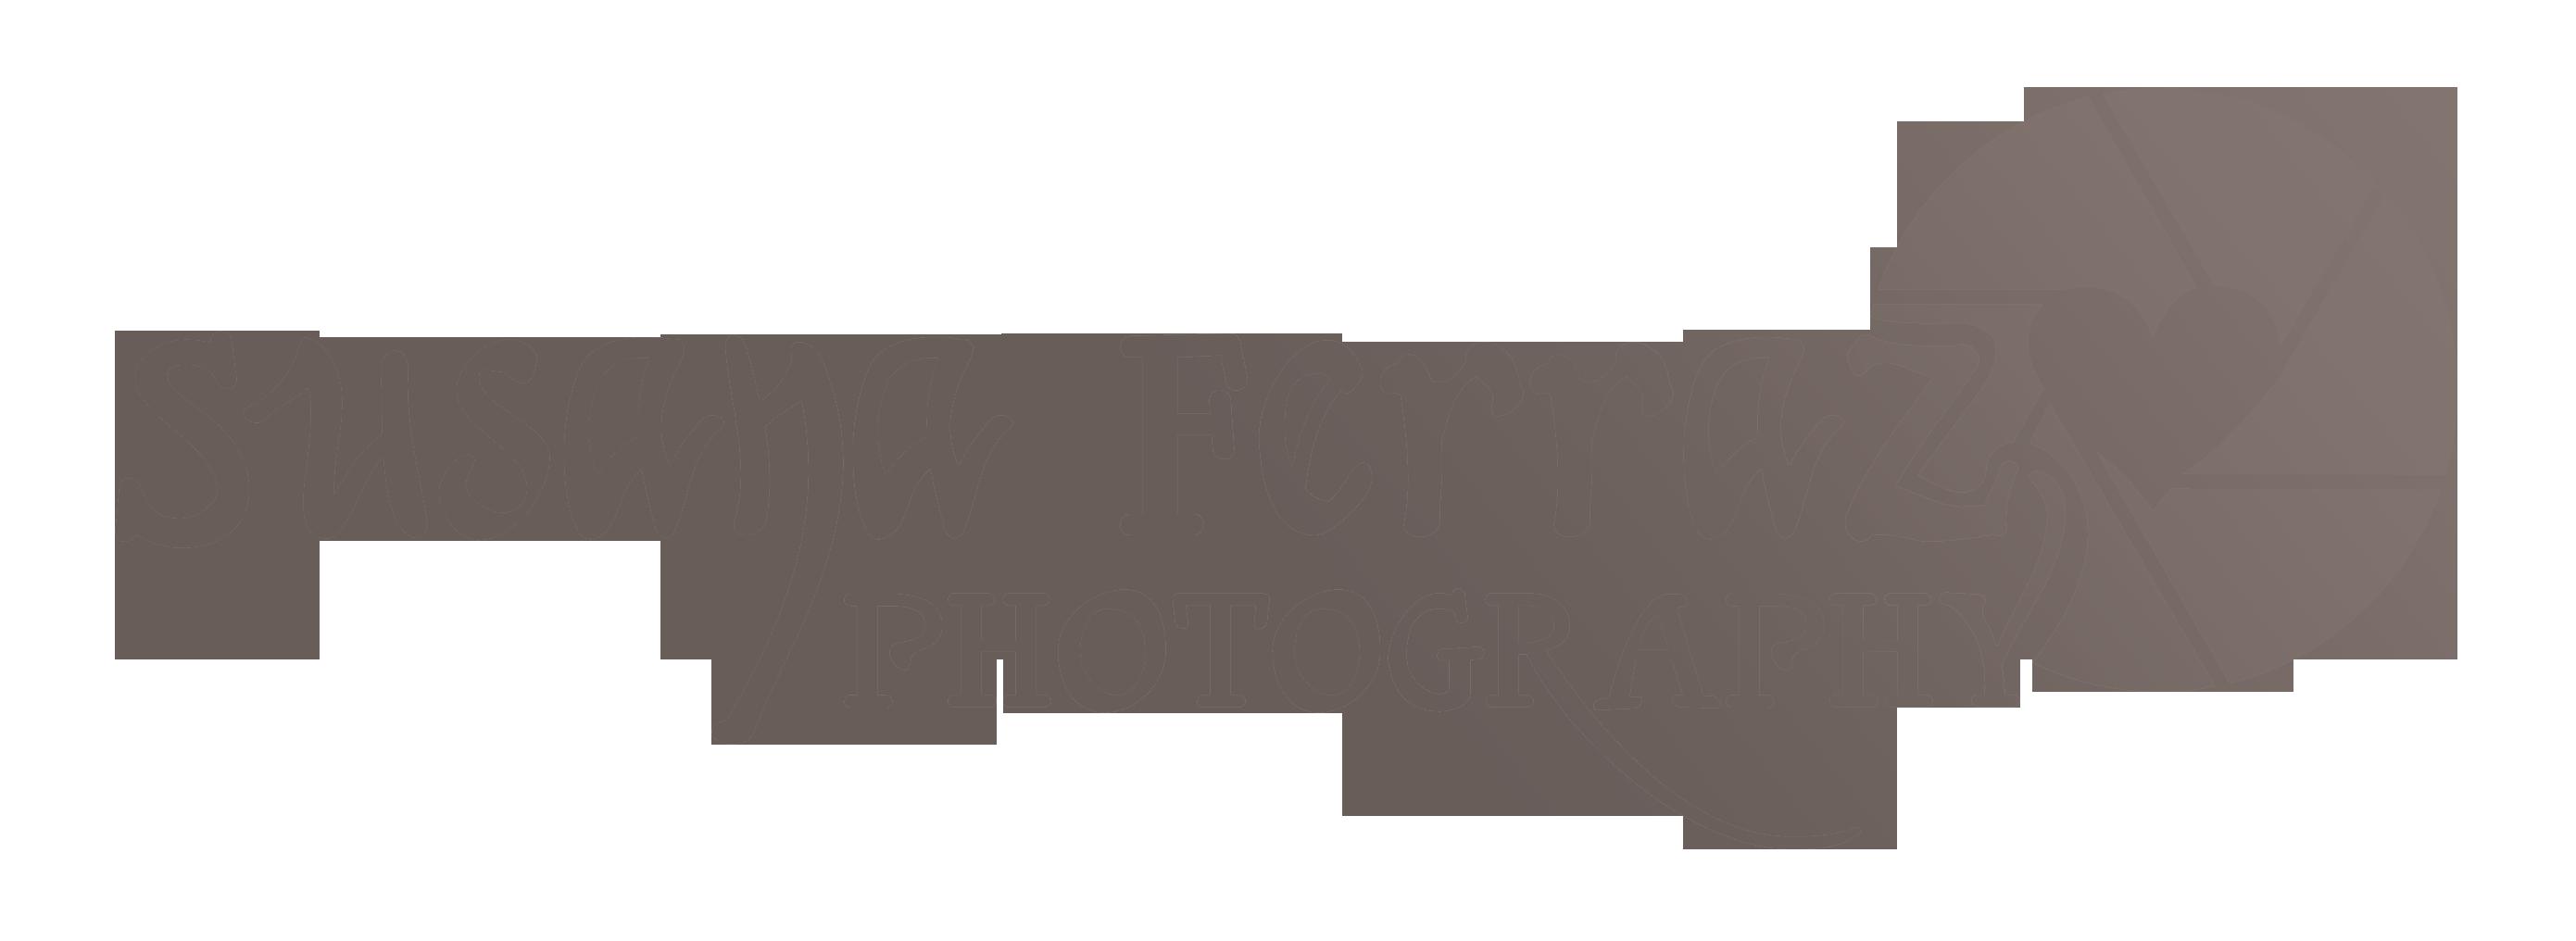 Susana Ferraz - Photography